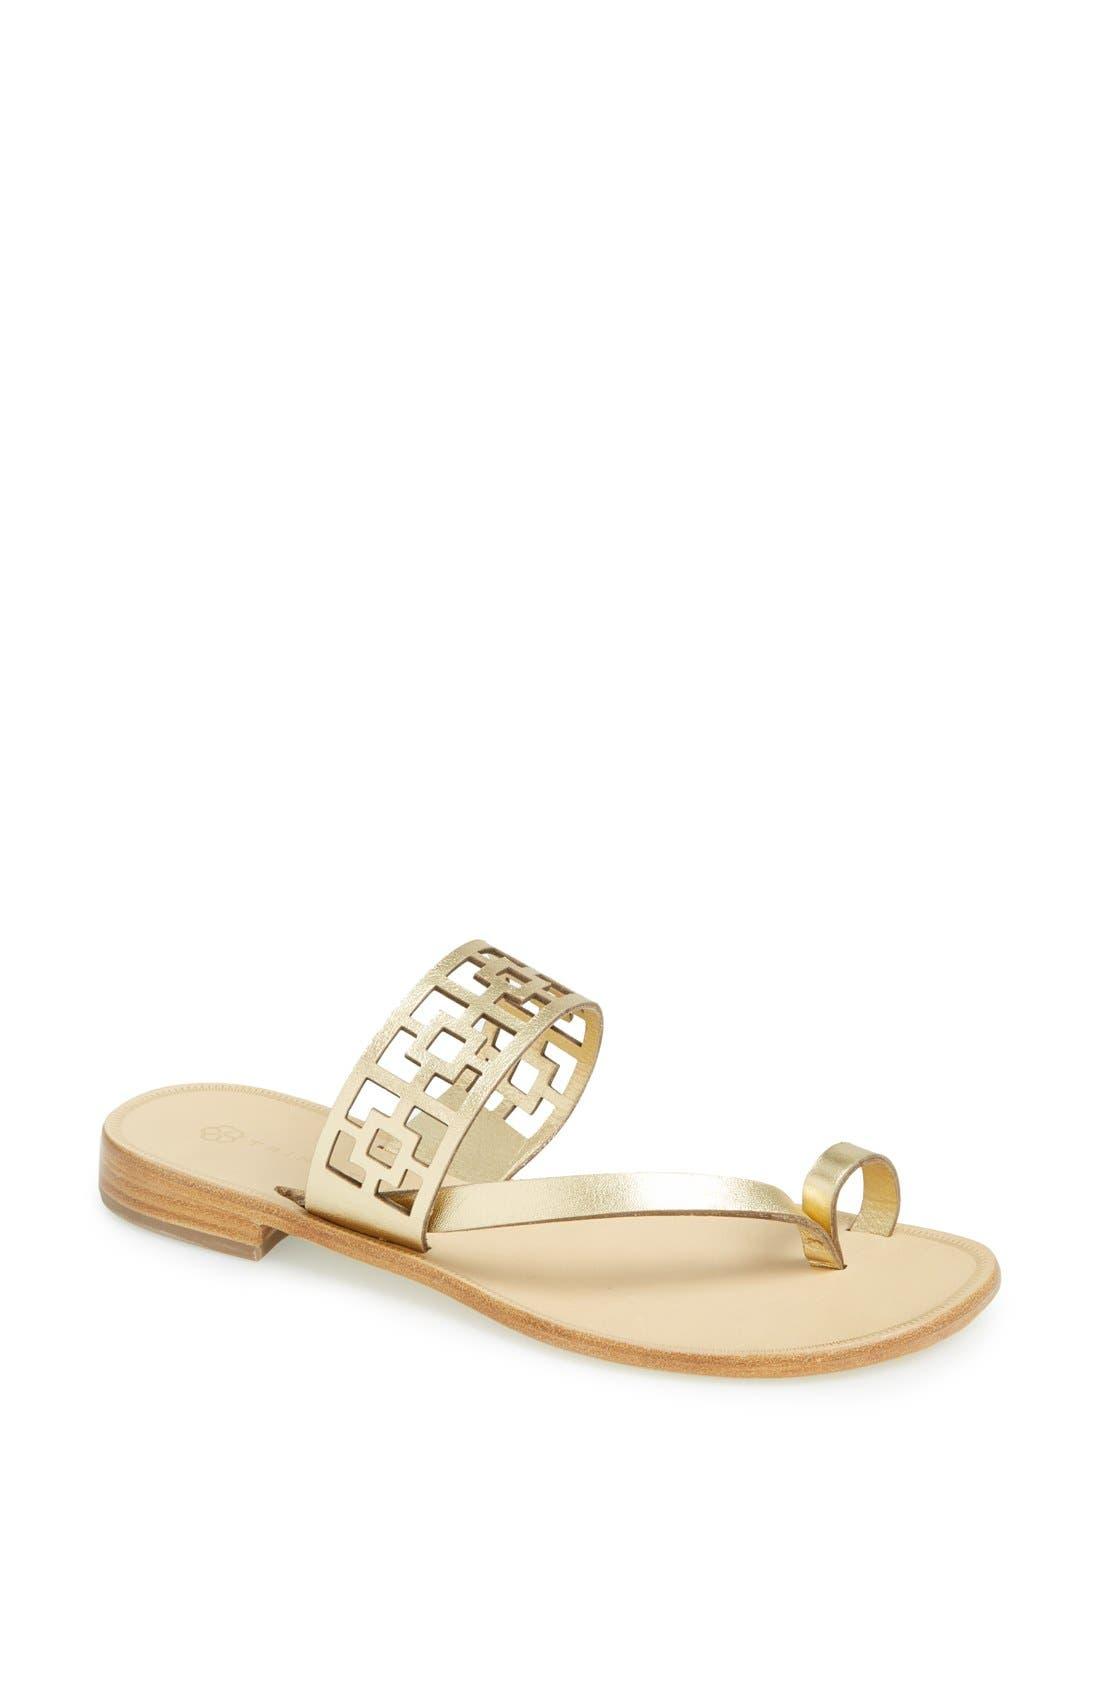 Alternate Image 1 Selected - Trina Turk 'Brentwood' Sandal